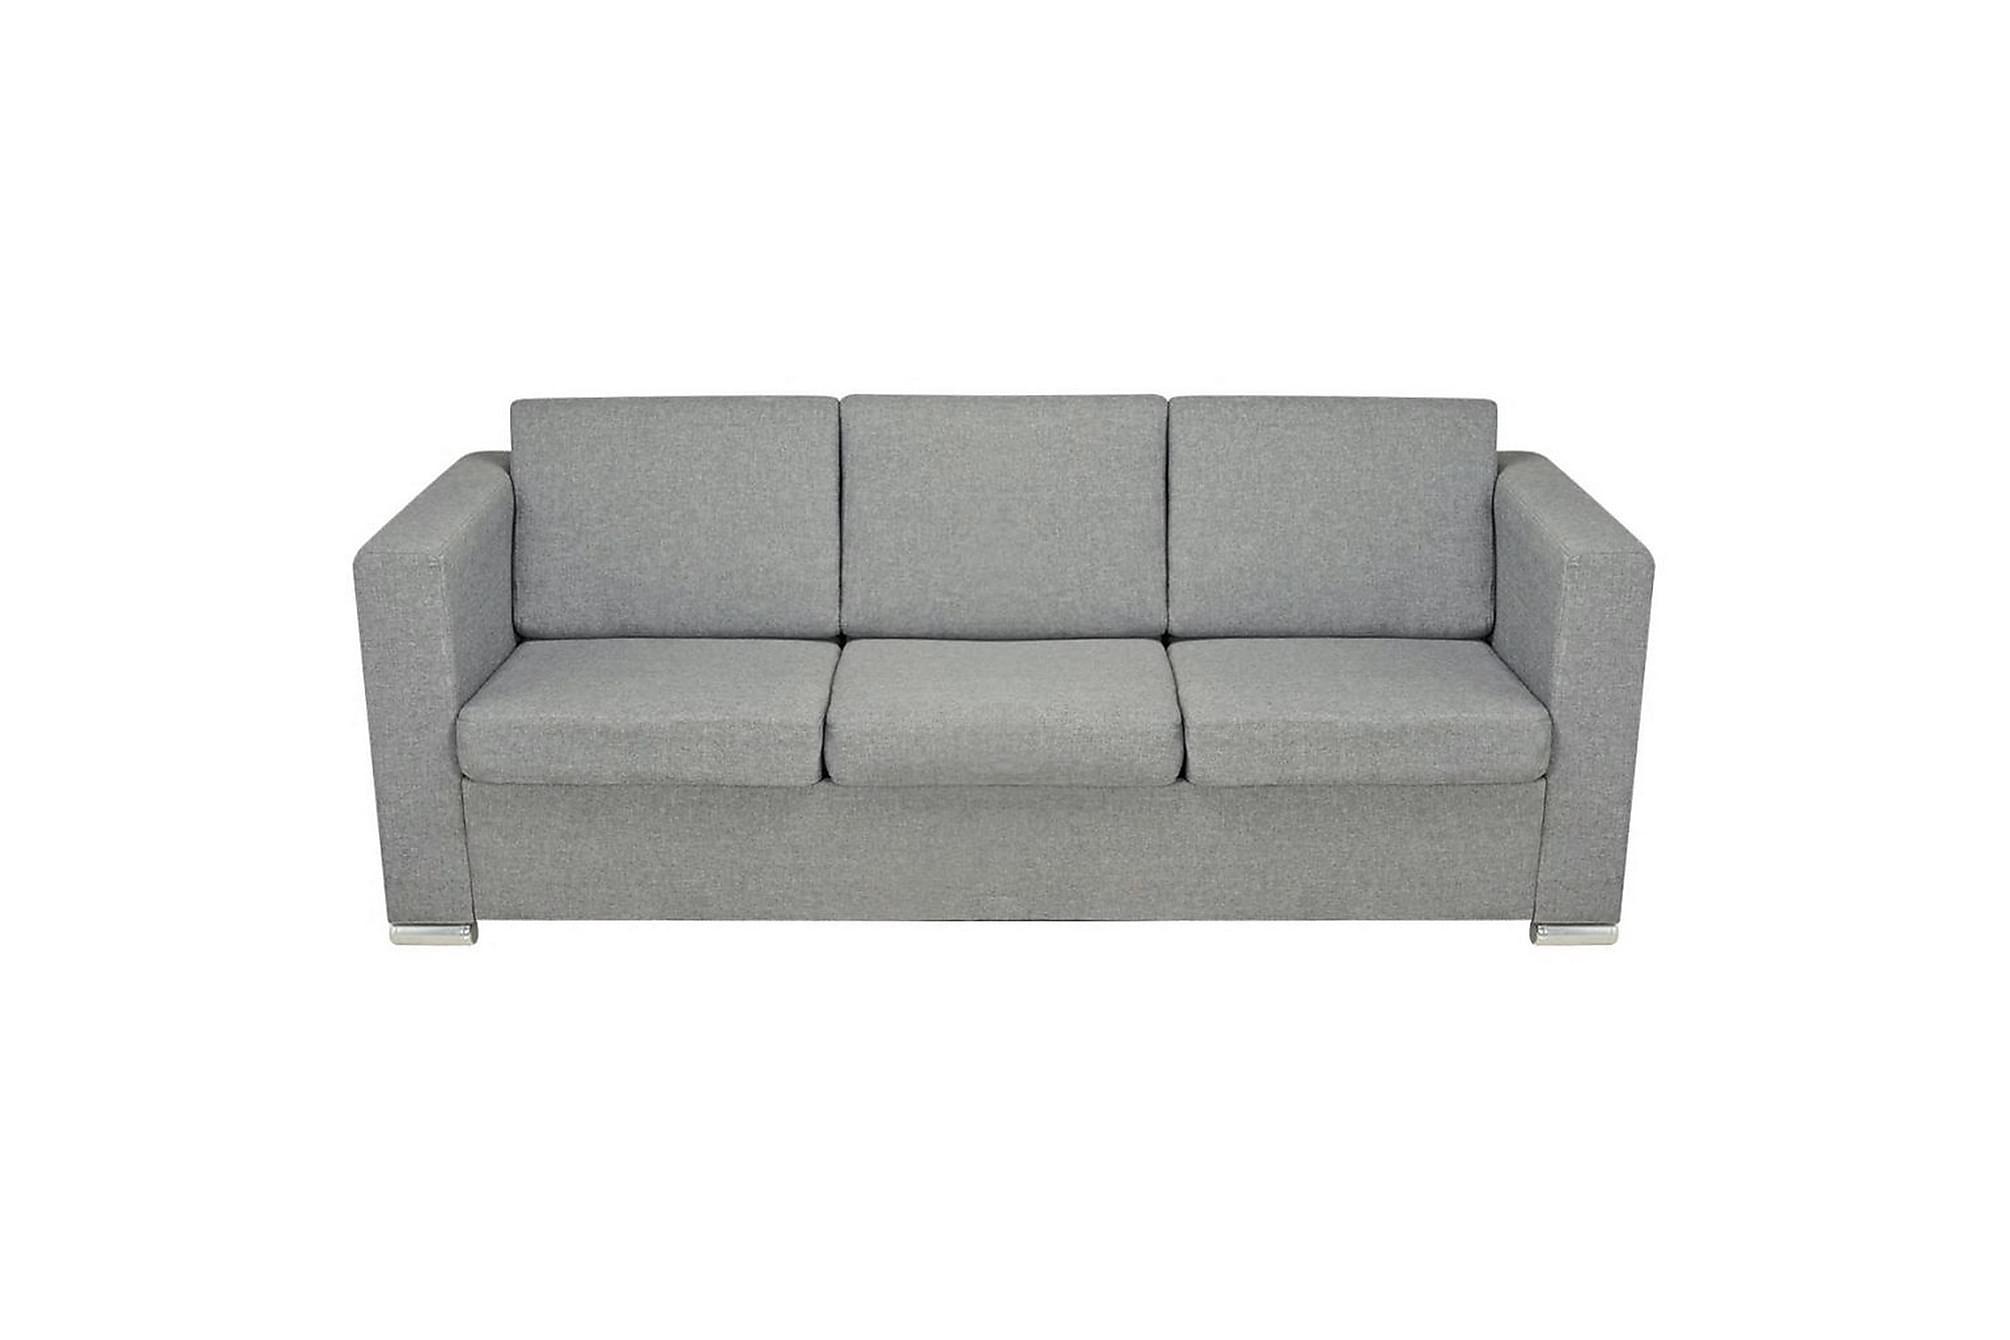 3-sitssoffa i tyg ljusgrå, 3-sits soffor